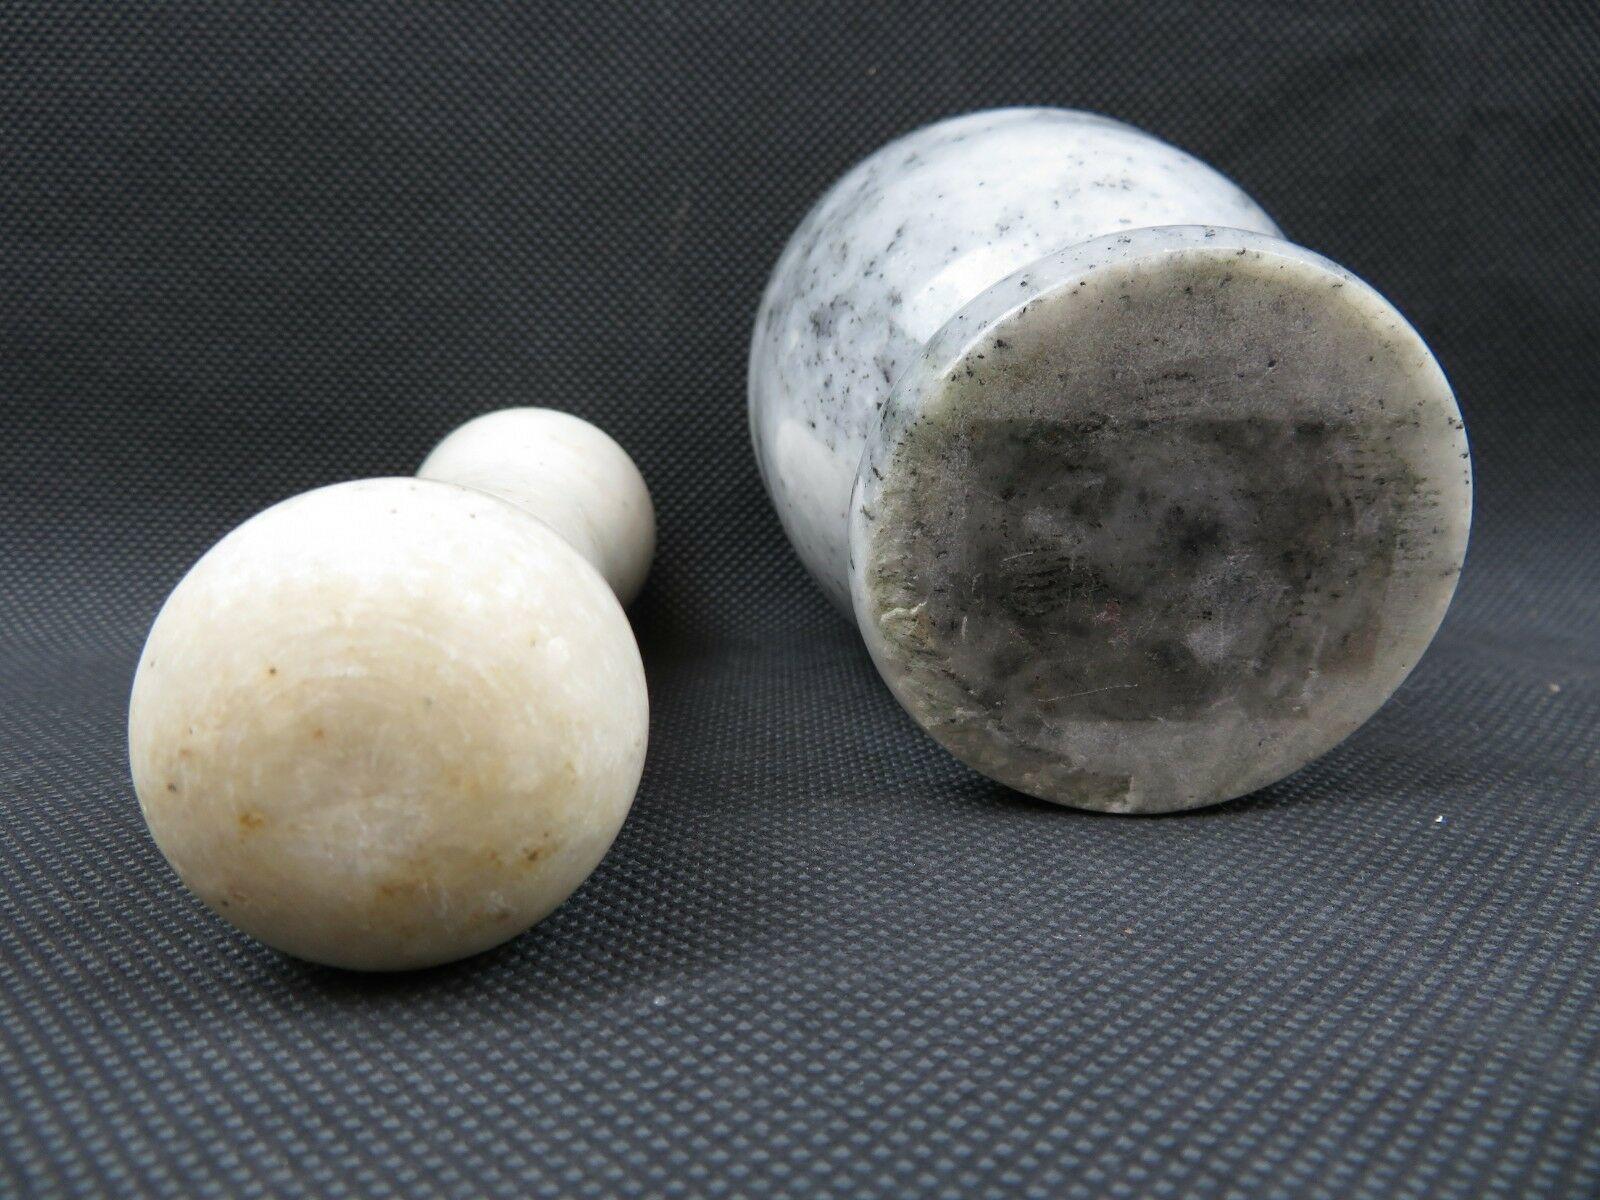 Vintage marble or granite polished mortar and pestle